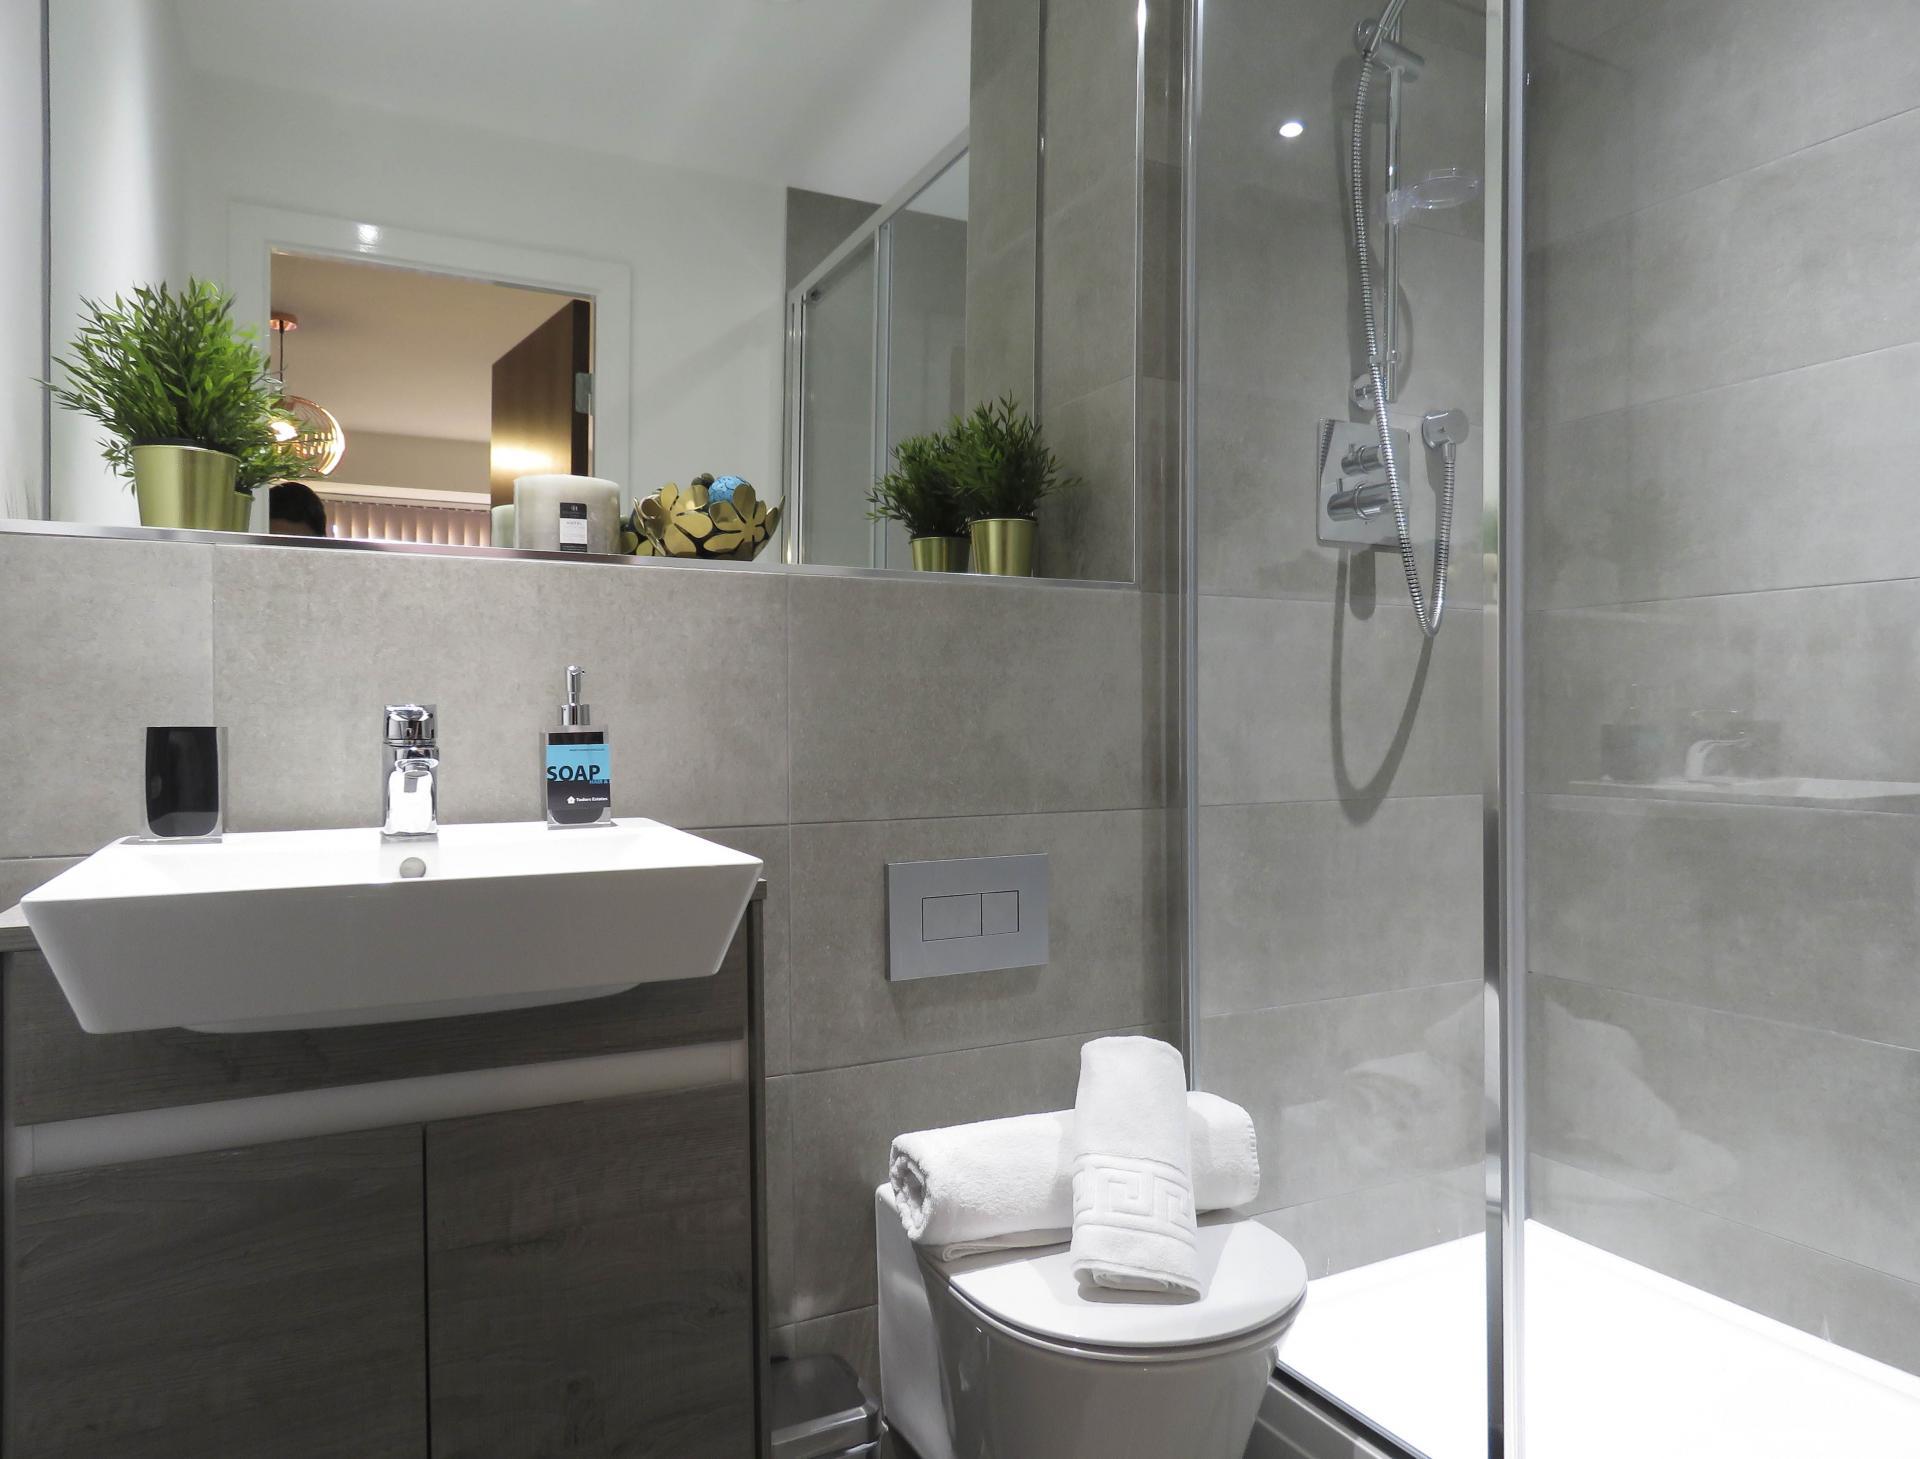 Sink at Kettleworks Serviced Apartments